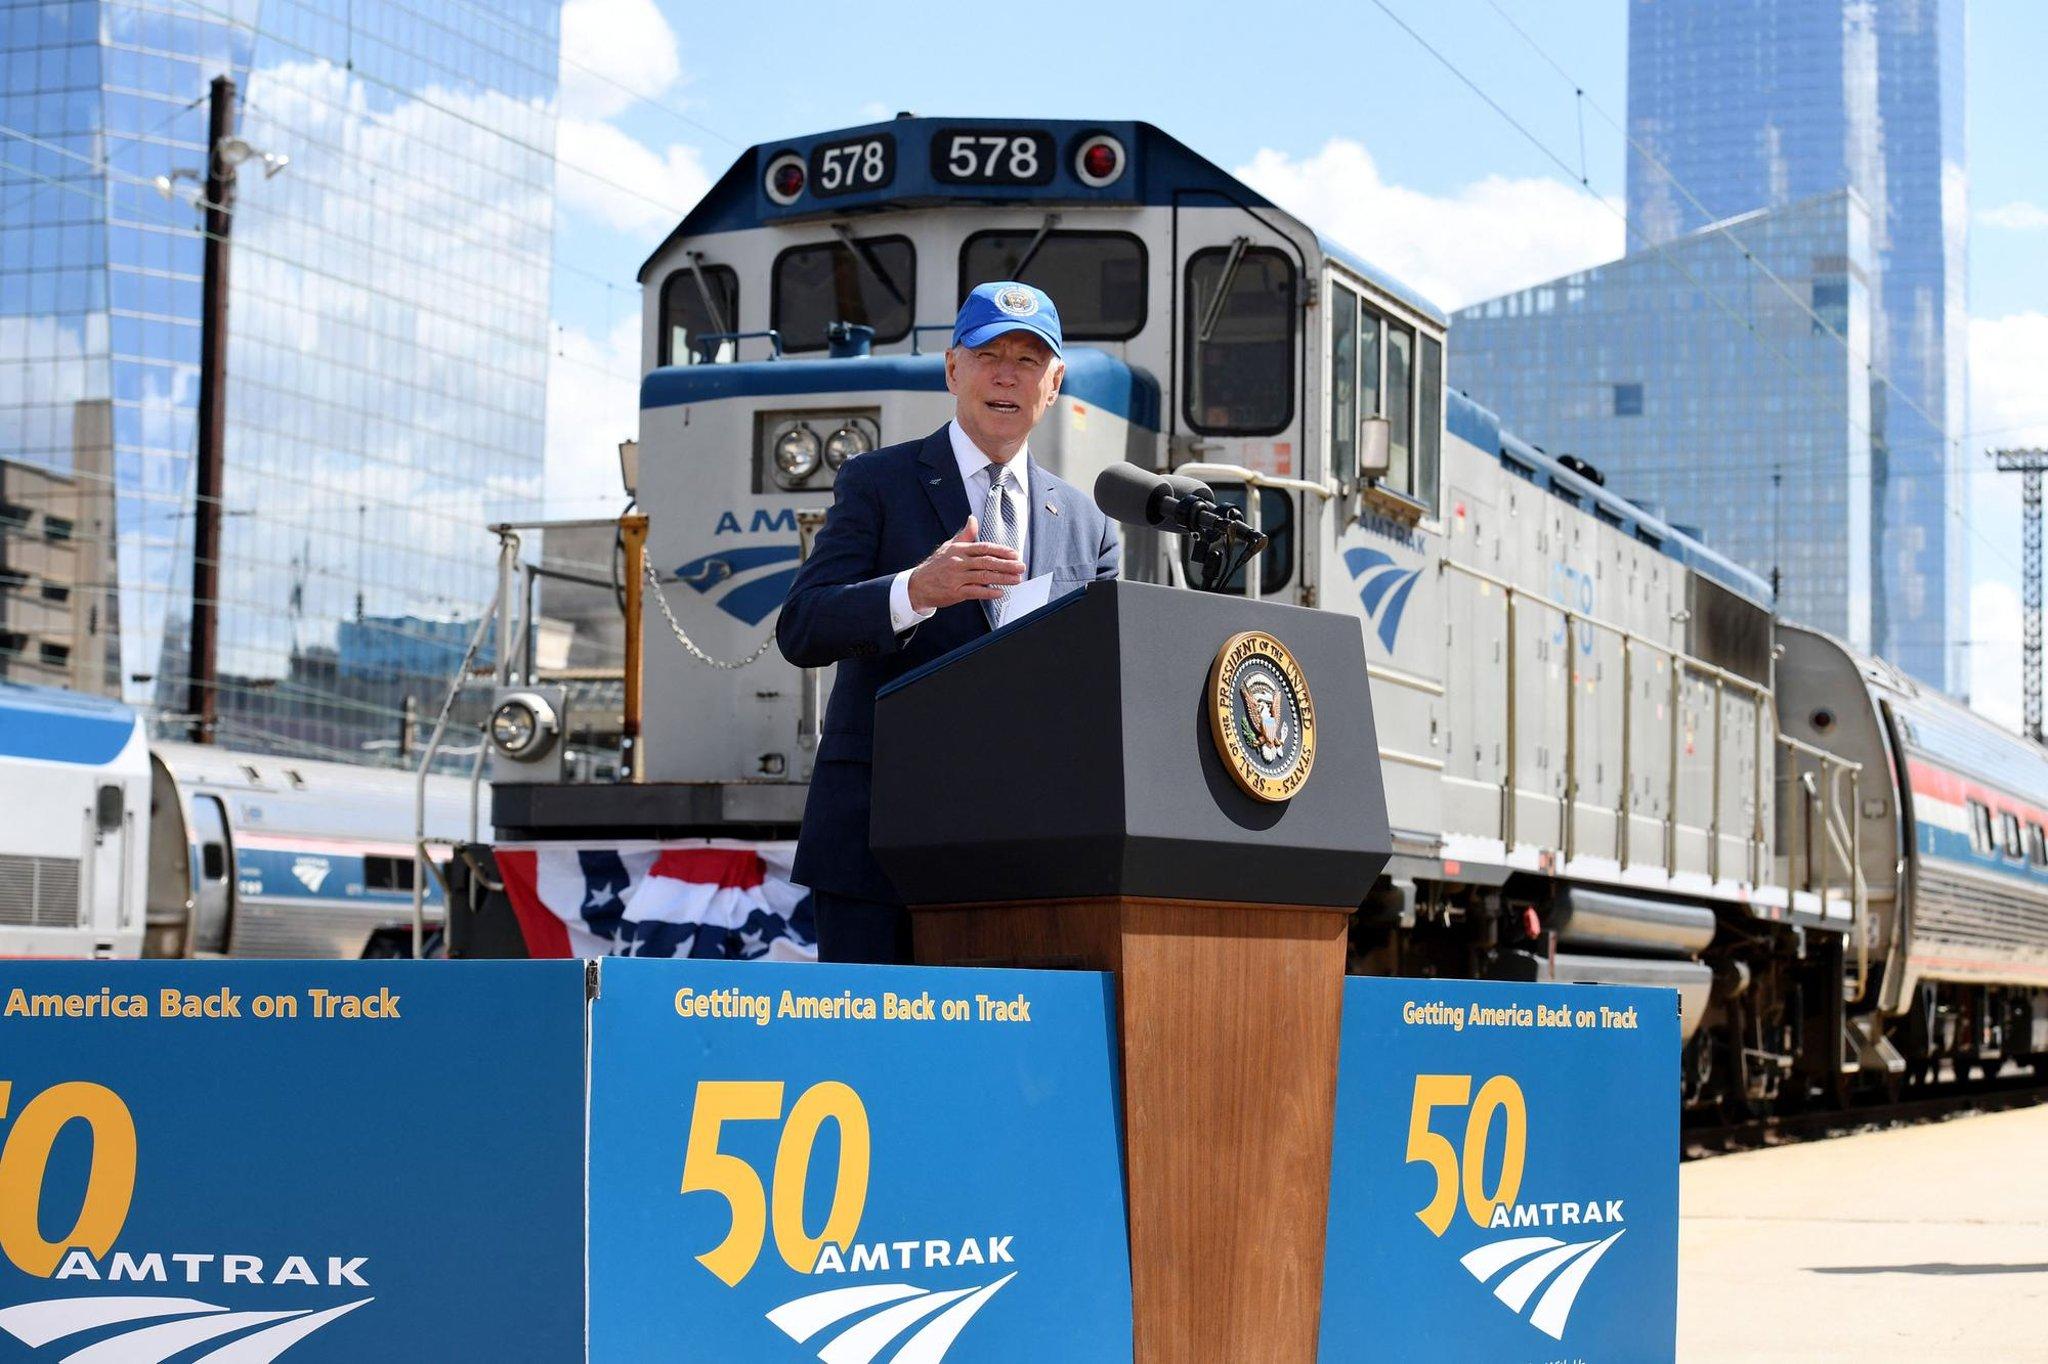 'Amtrak Joe' Biden riding the rails to UN climate summit would highlight green credentials of trains – Alastair Dalton